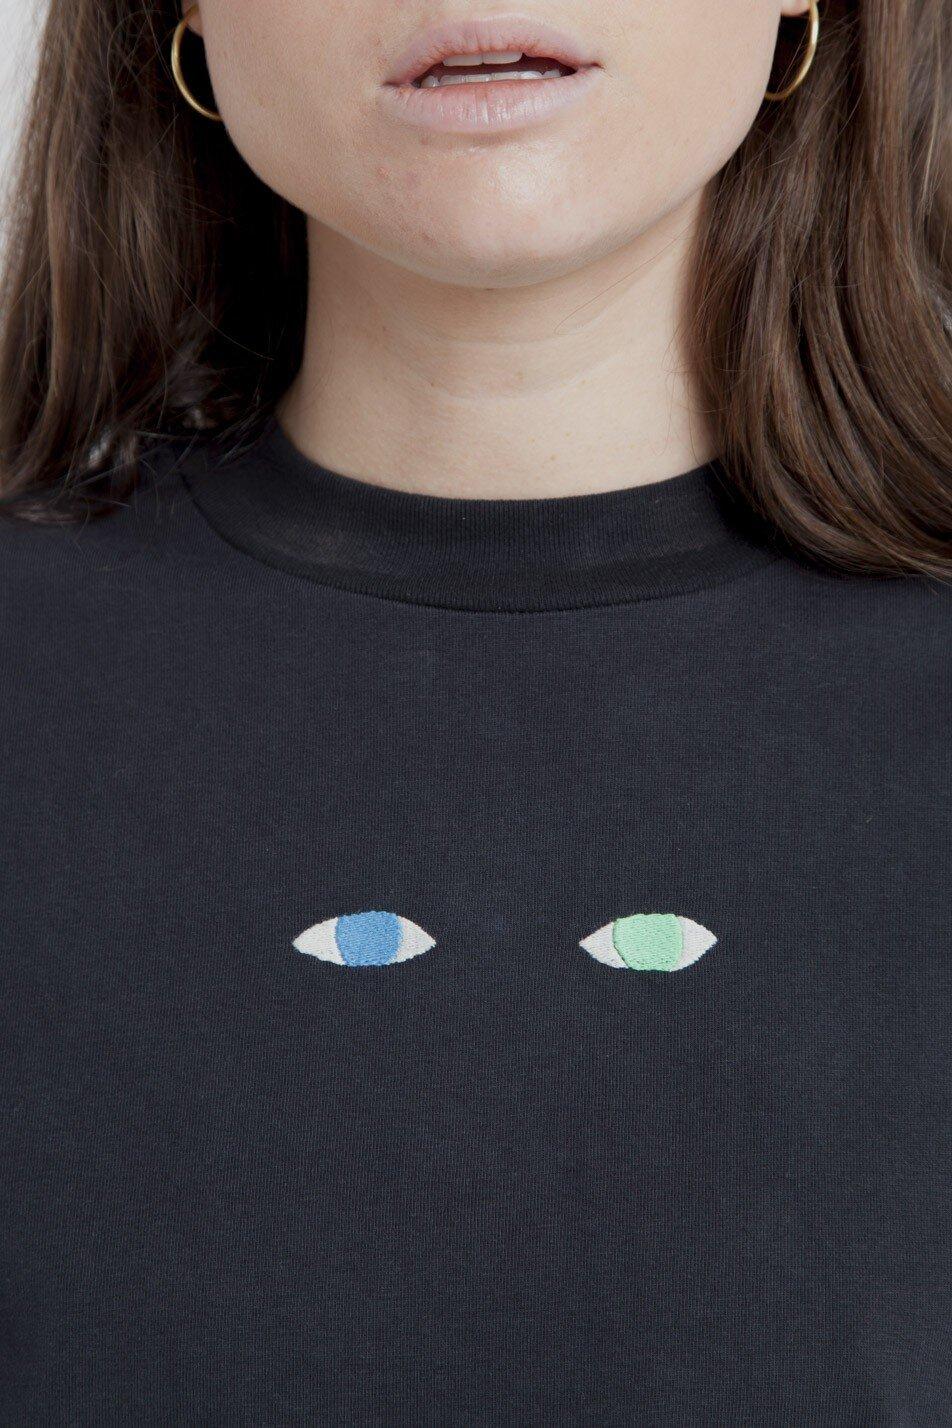 wolf-eyes-sweatshirt-2.jpg